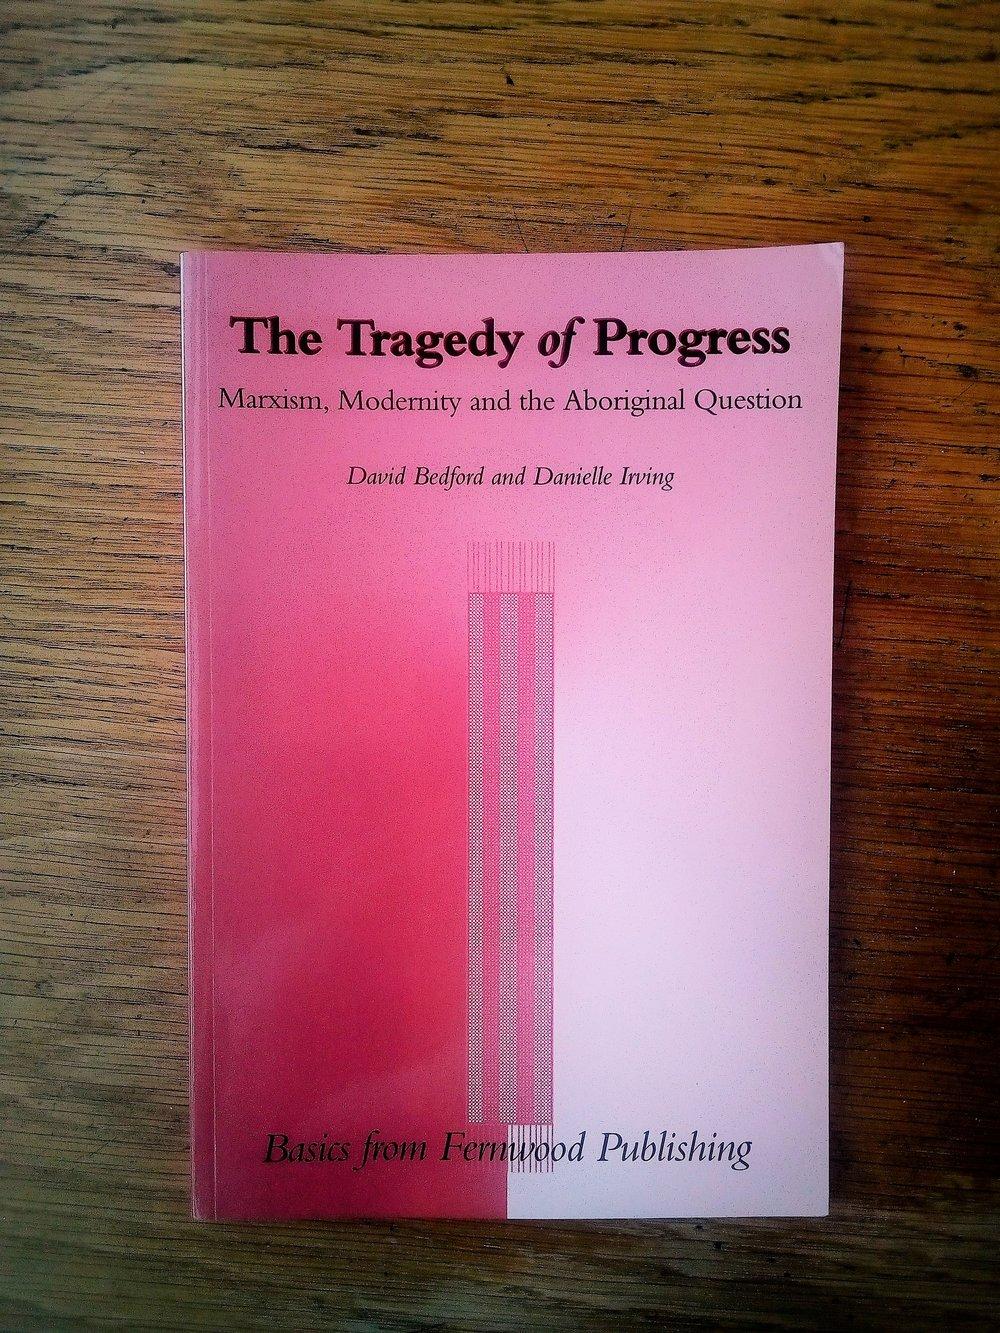 tragedy of progress book cover .jpg